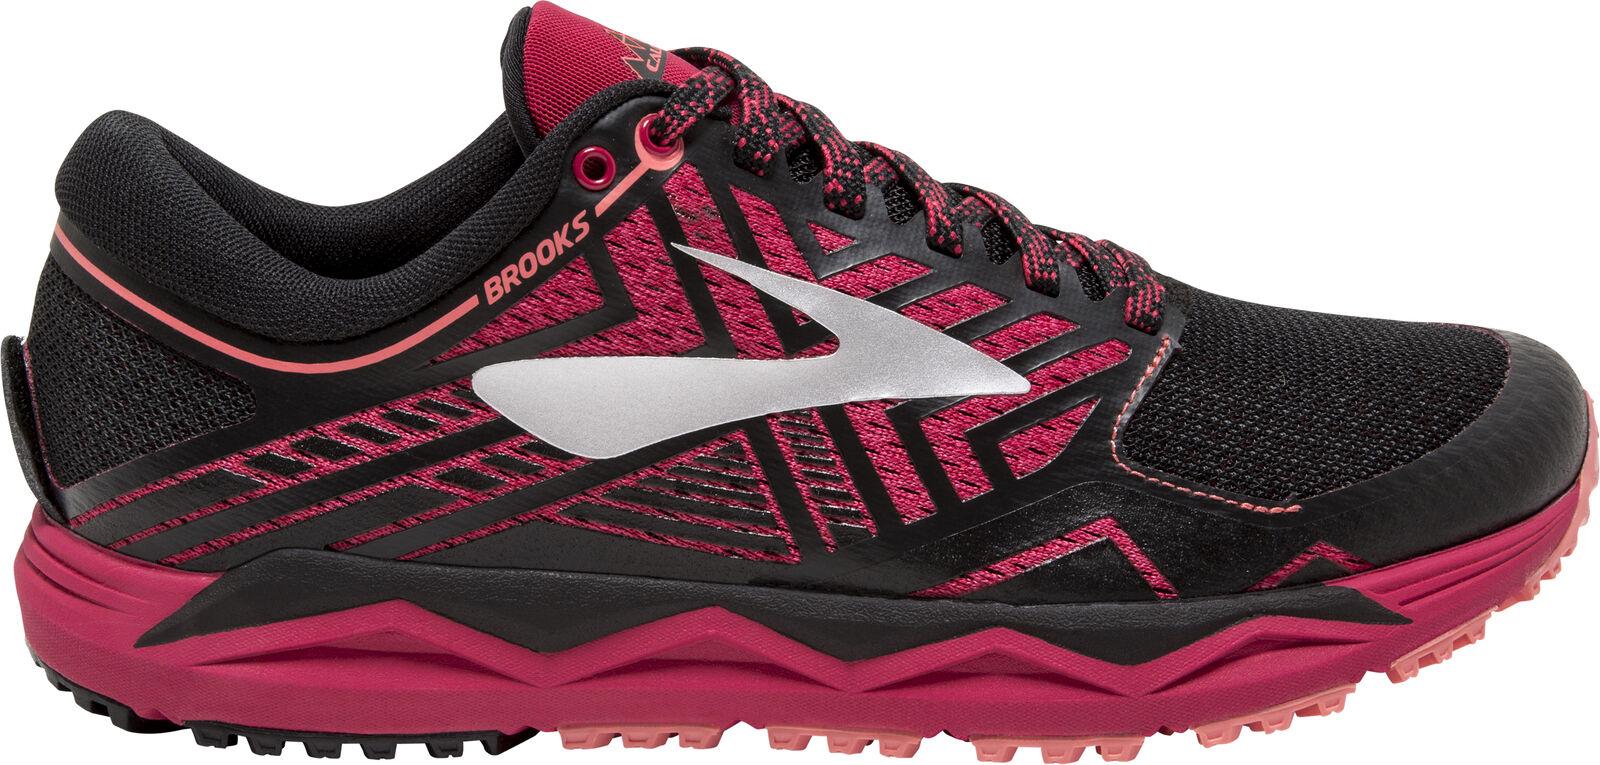 Brooks Caldera 2 Womens Trail Running shoes - Black